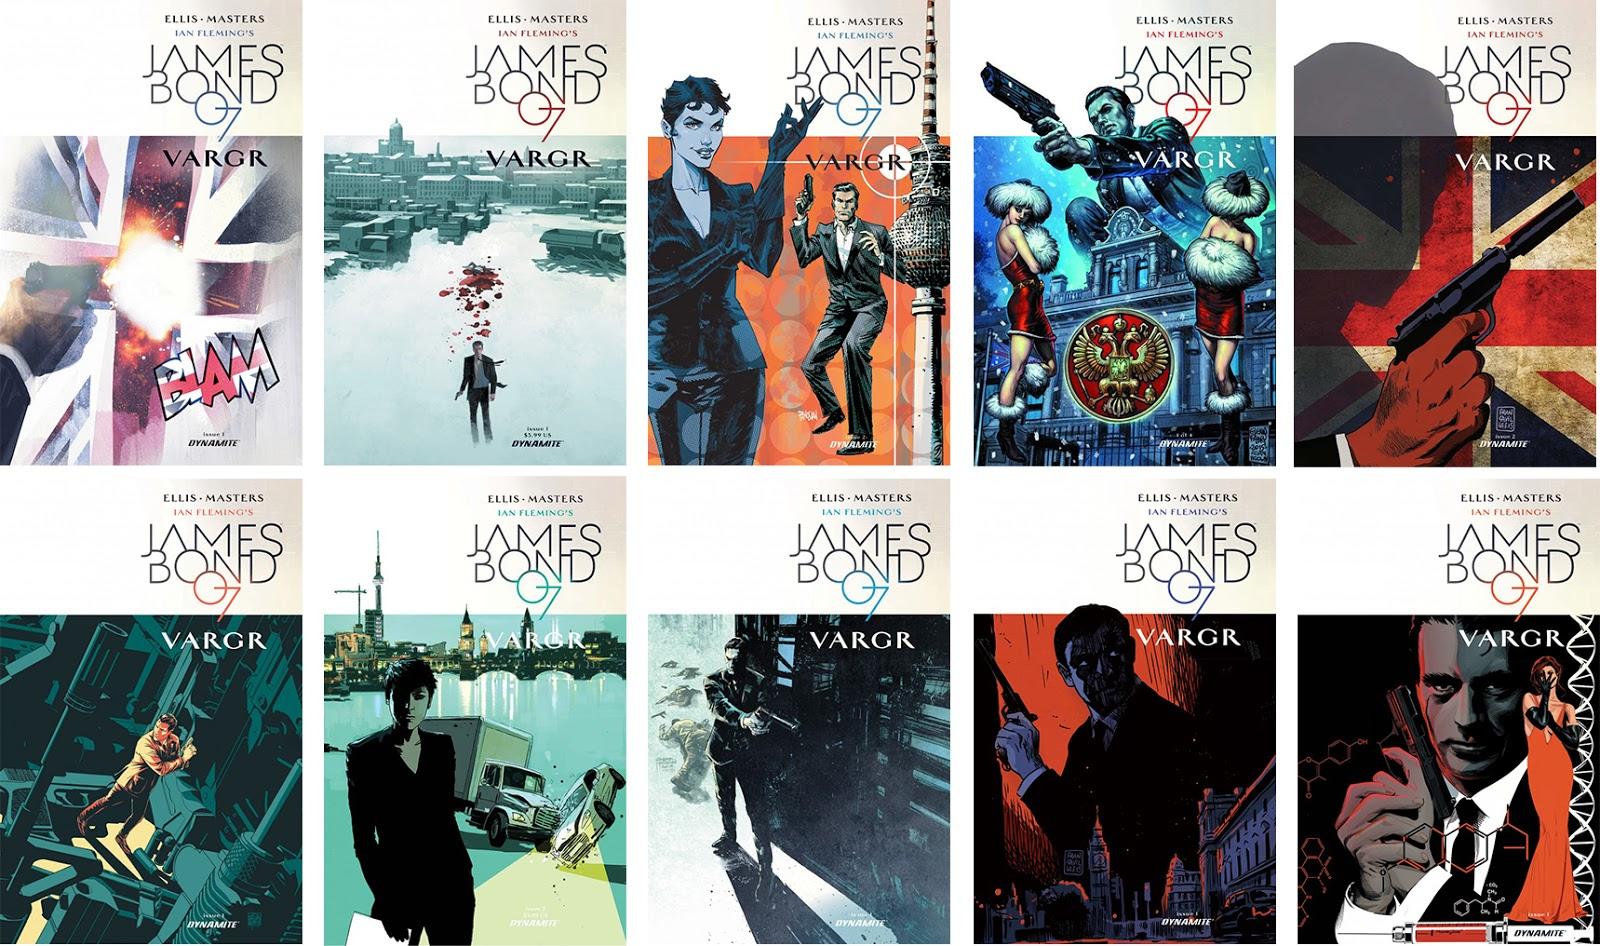 James Bond Book Cover Art : Illustrated the art of james bond